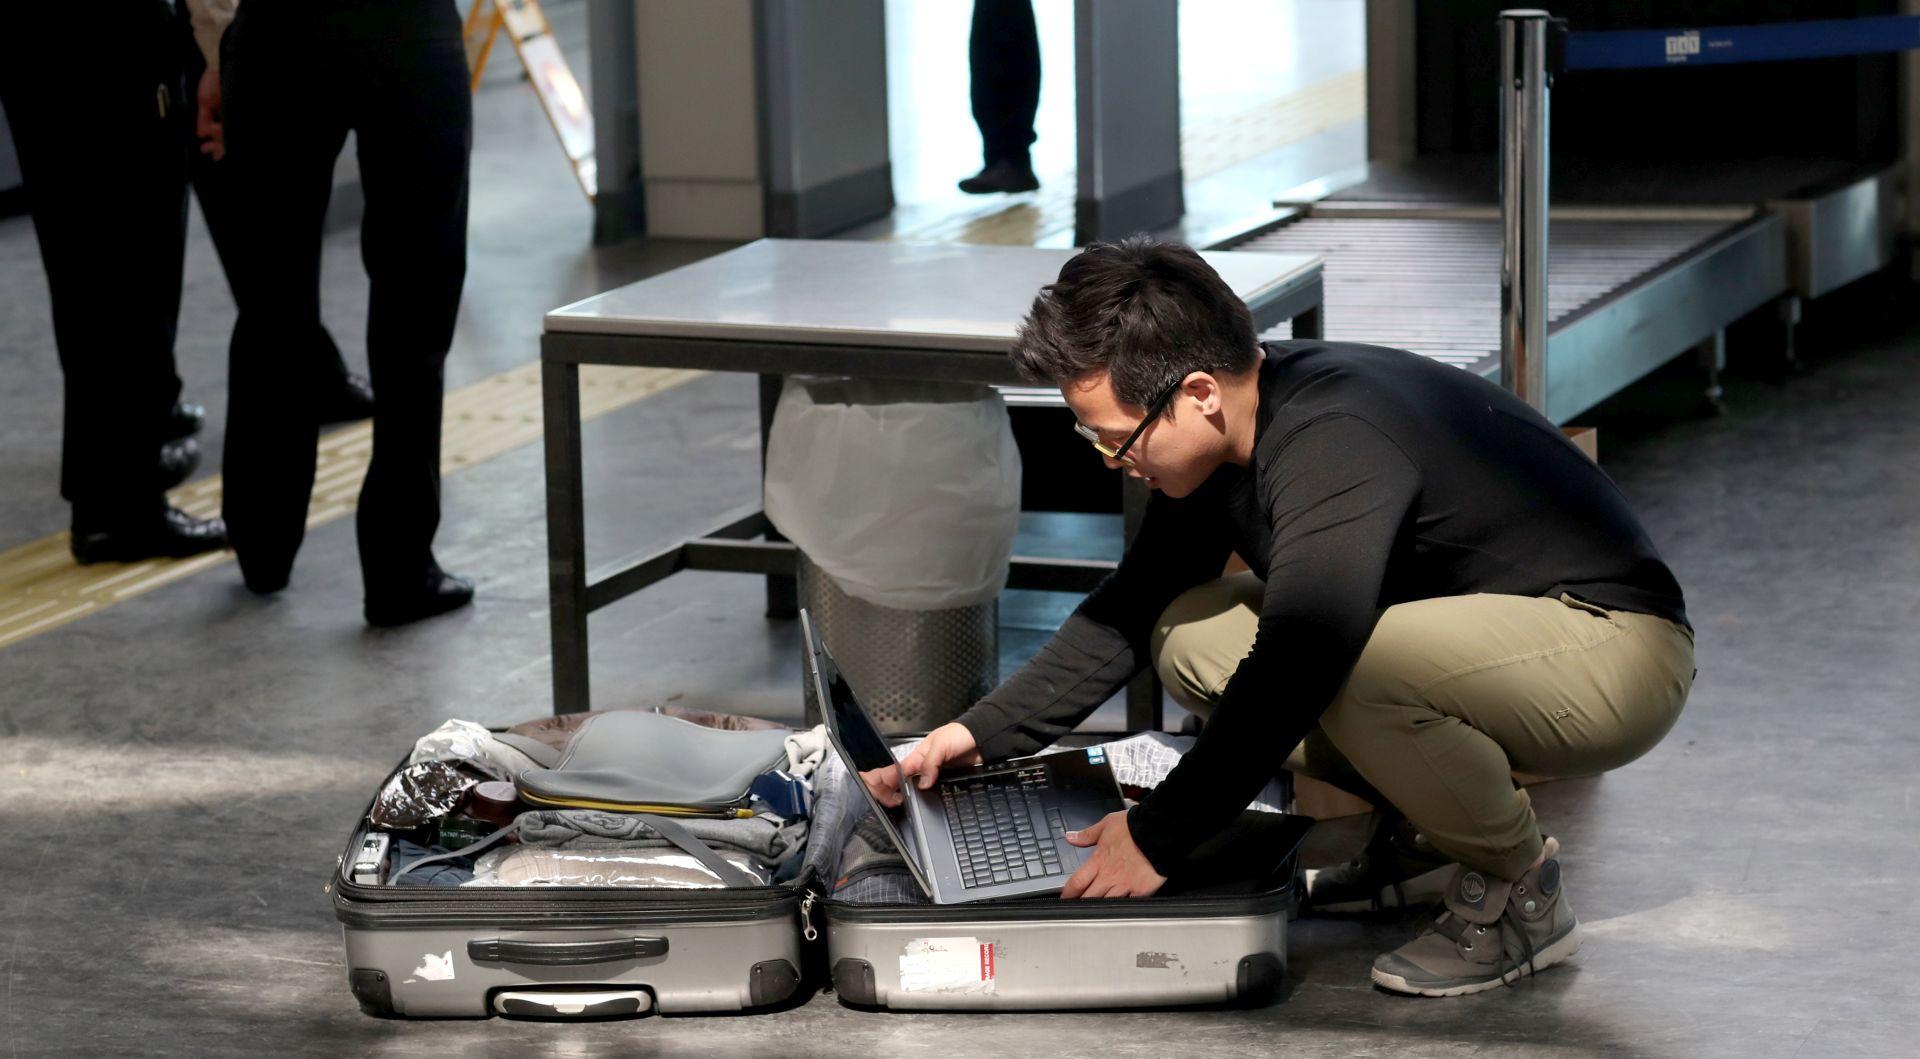 Istanbulska zračna luka počela provoditi zabranu elektroničke opreme na letovima